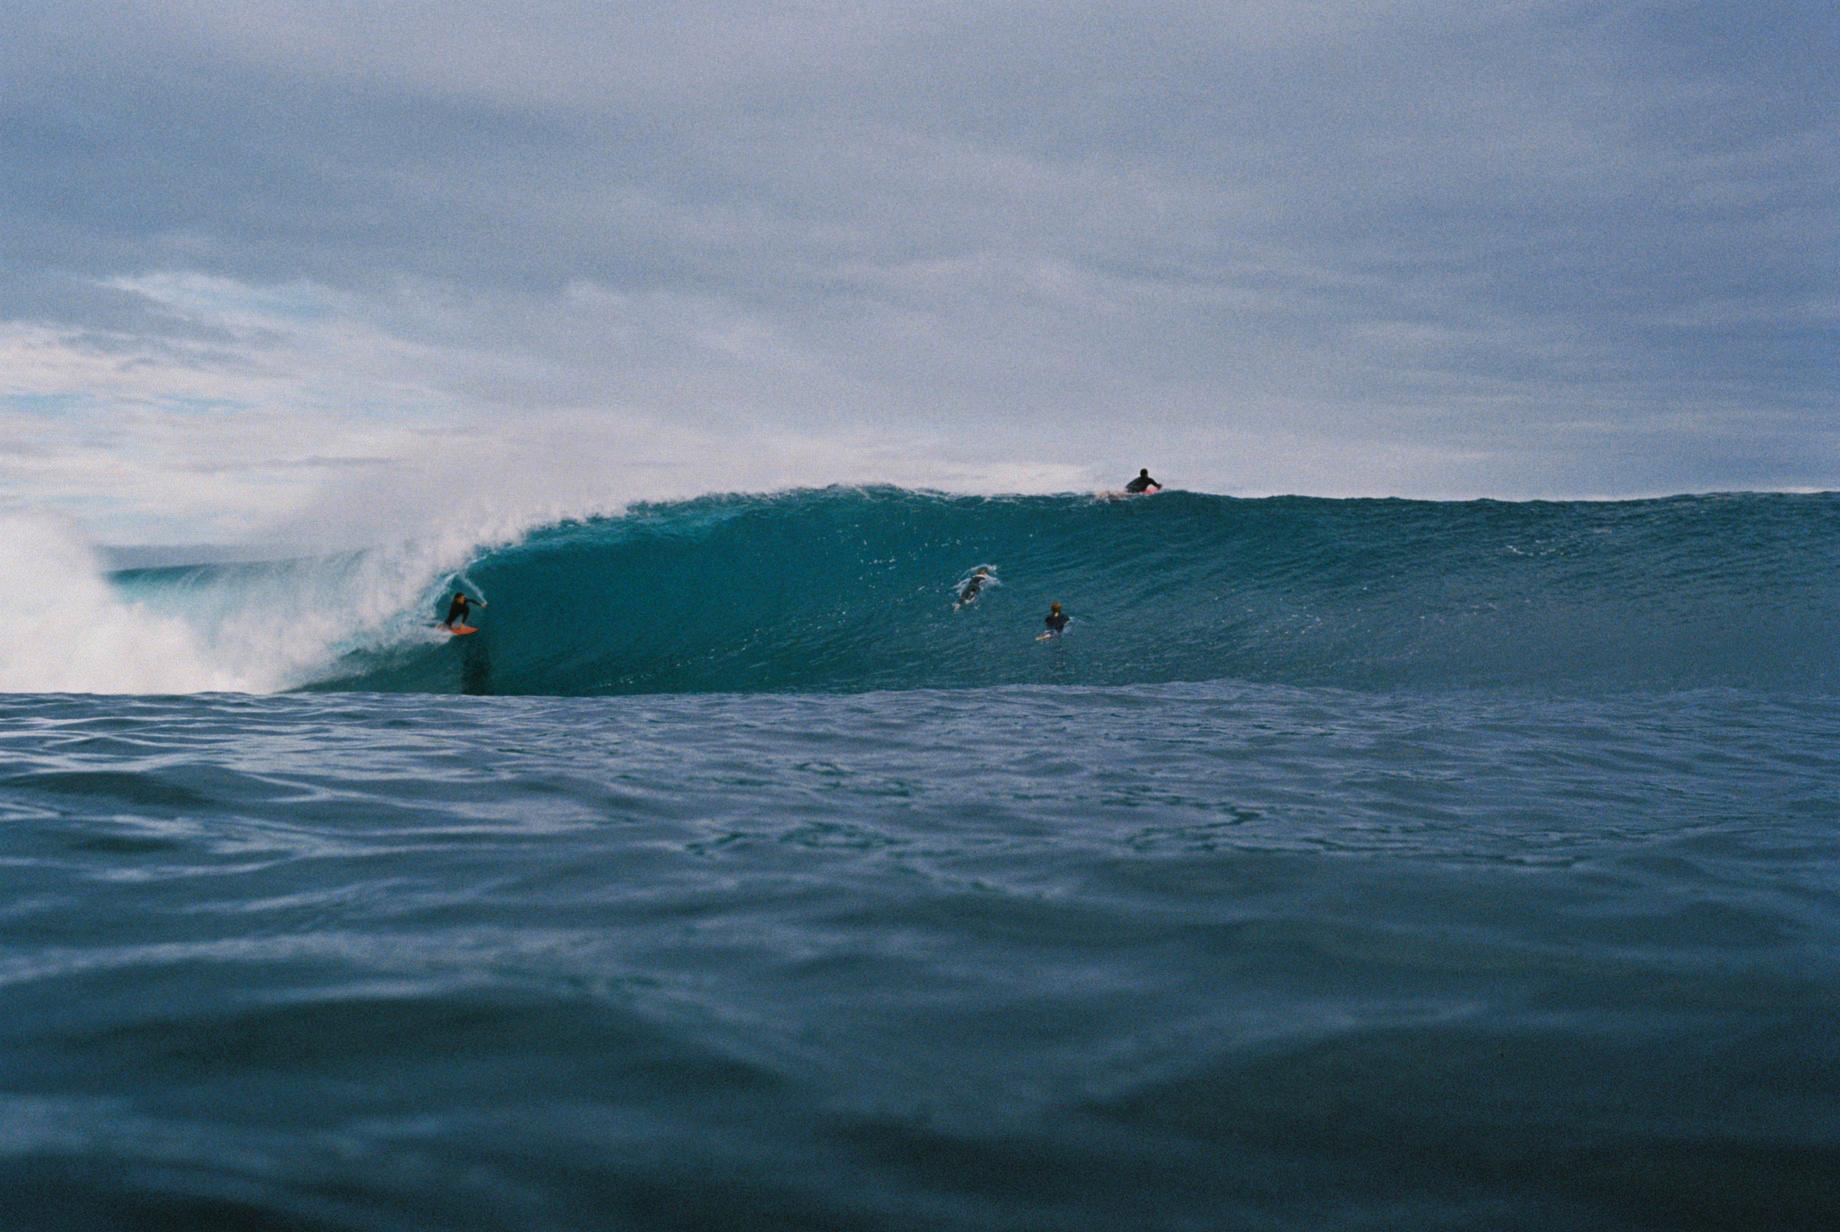 Salt Water Australia surf LG wave 4